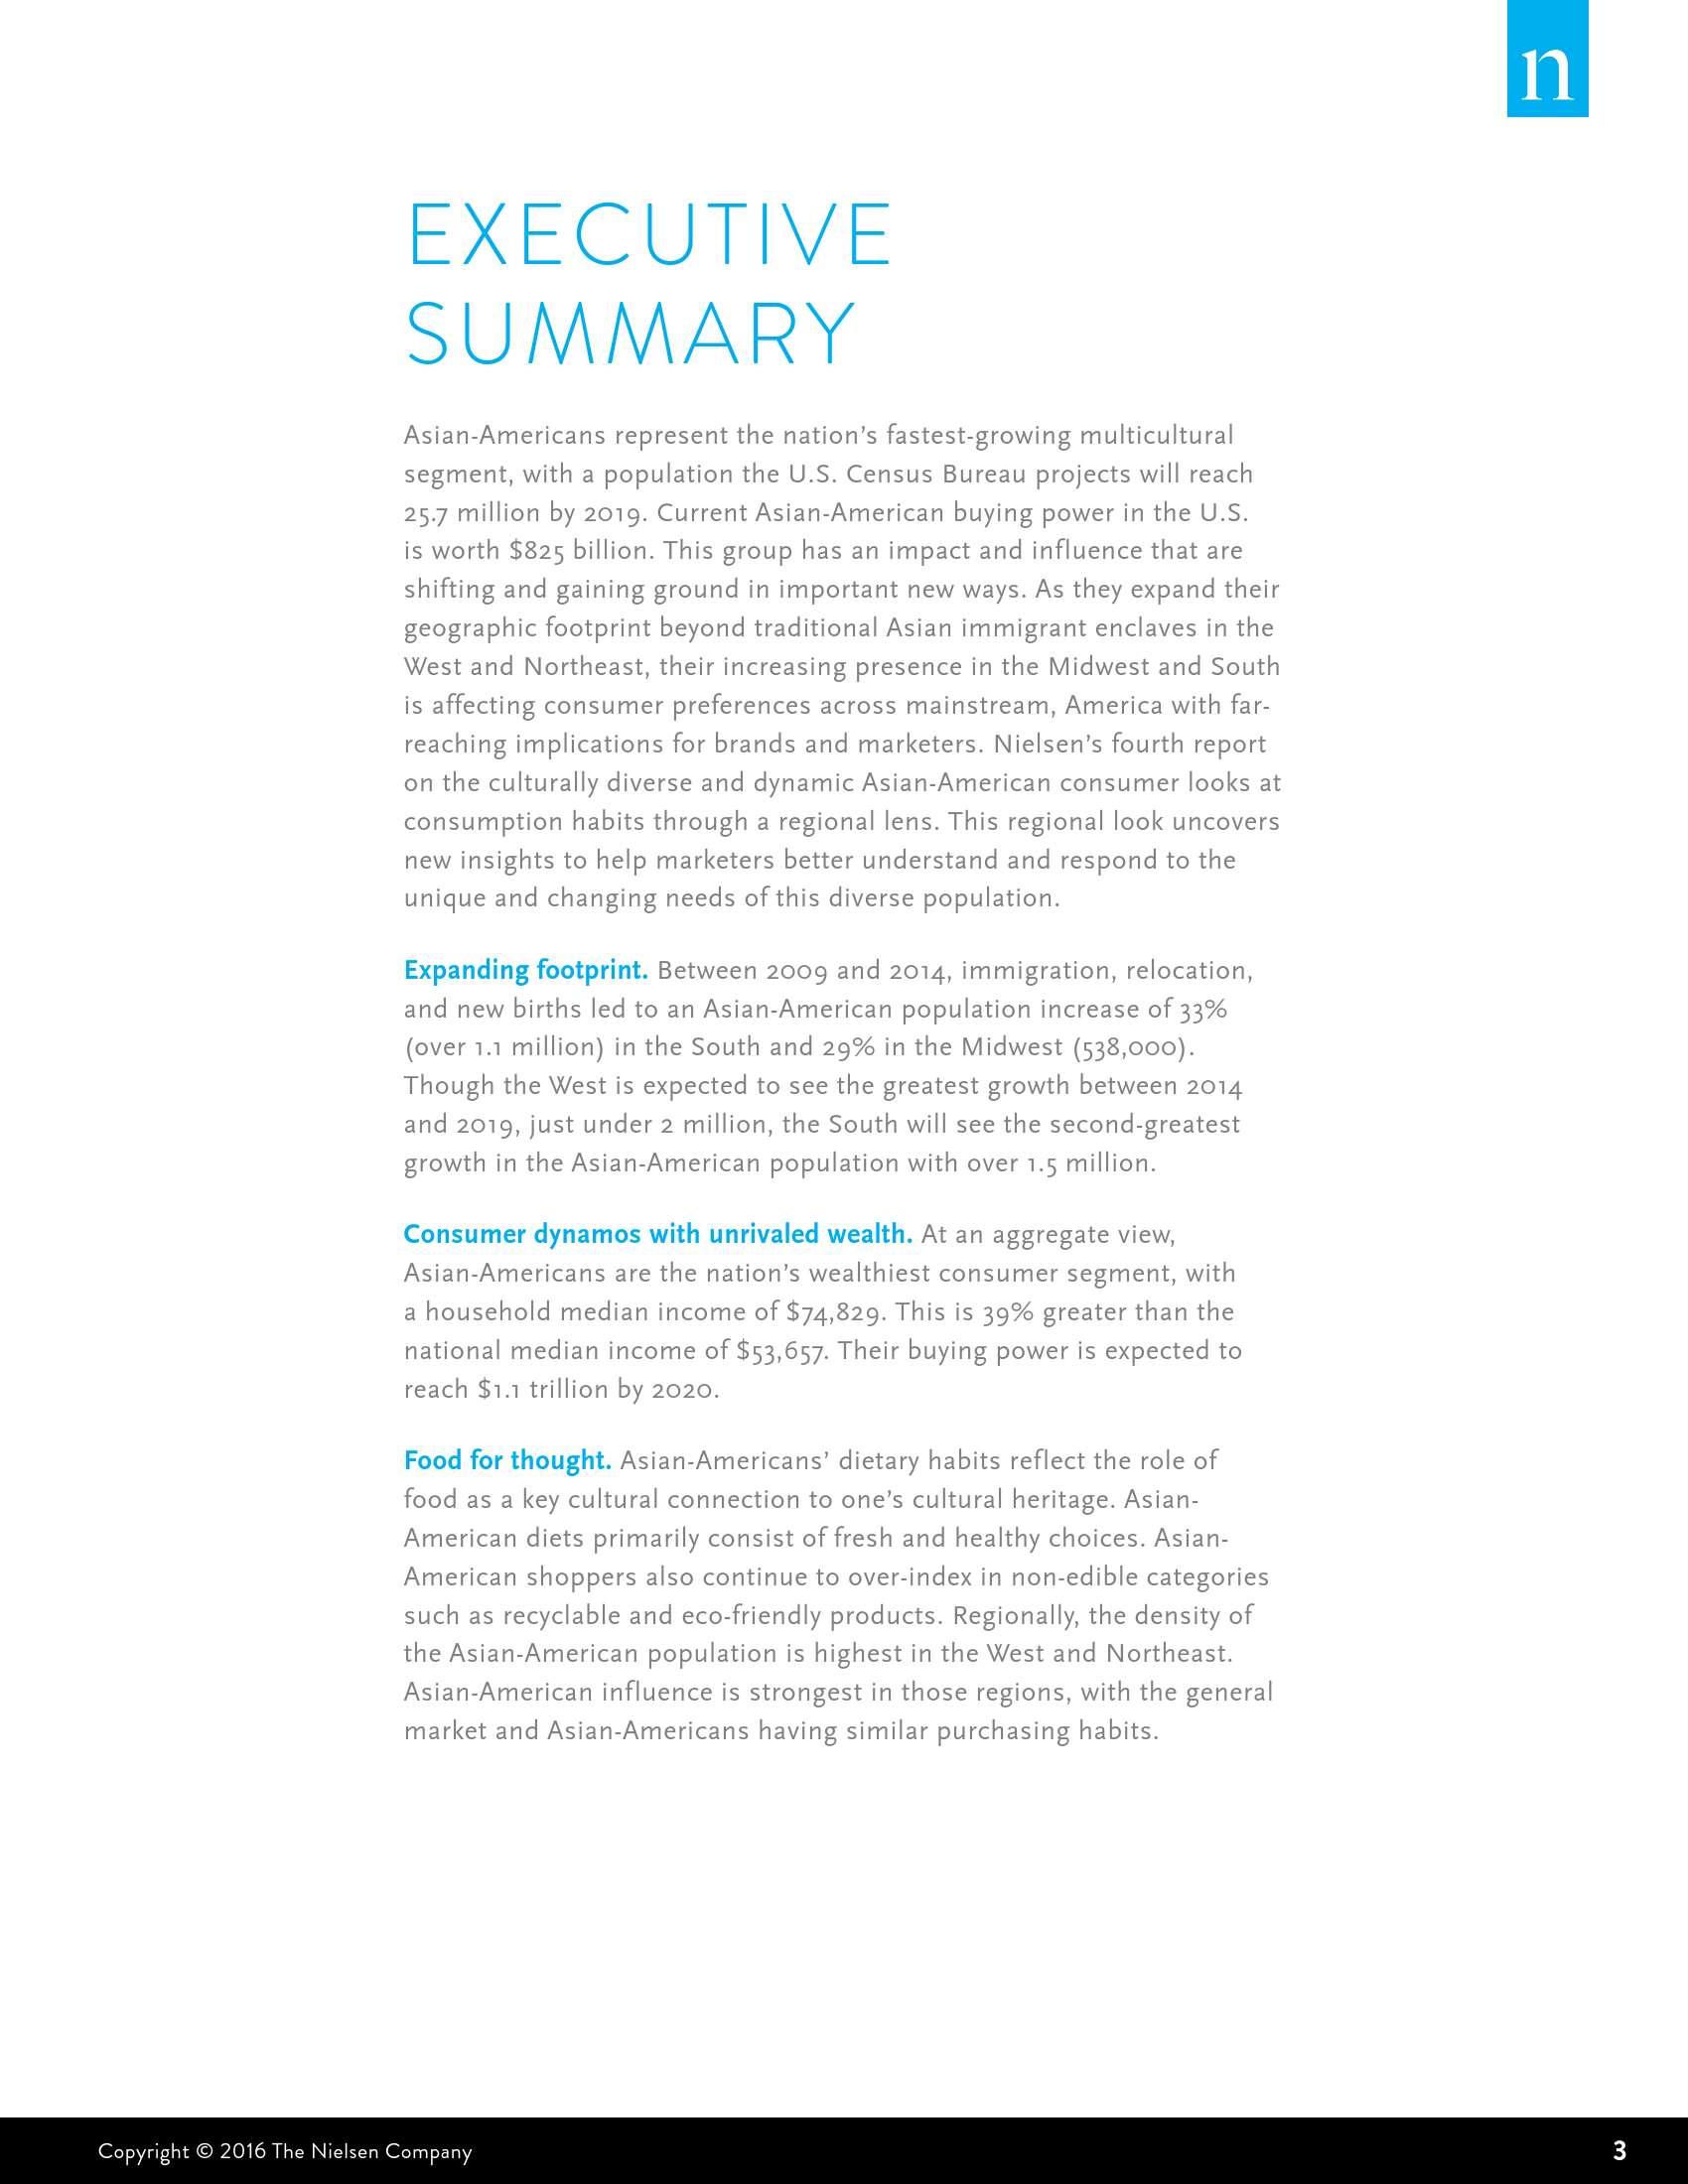 Nielsen:2016年美国亚裔消费者调查报告_000003